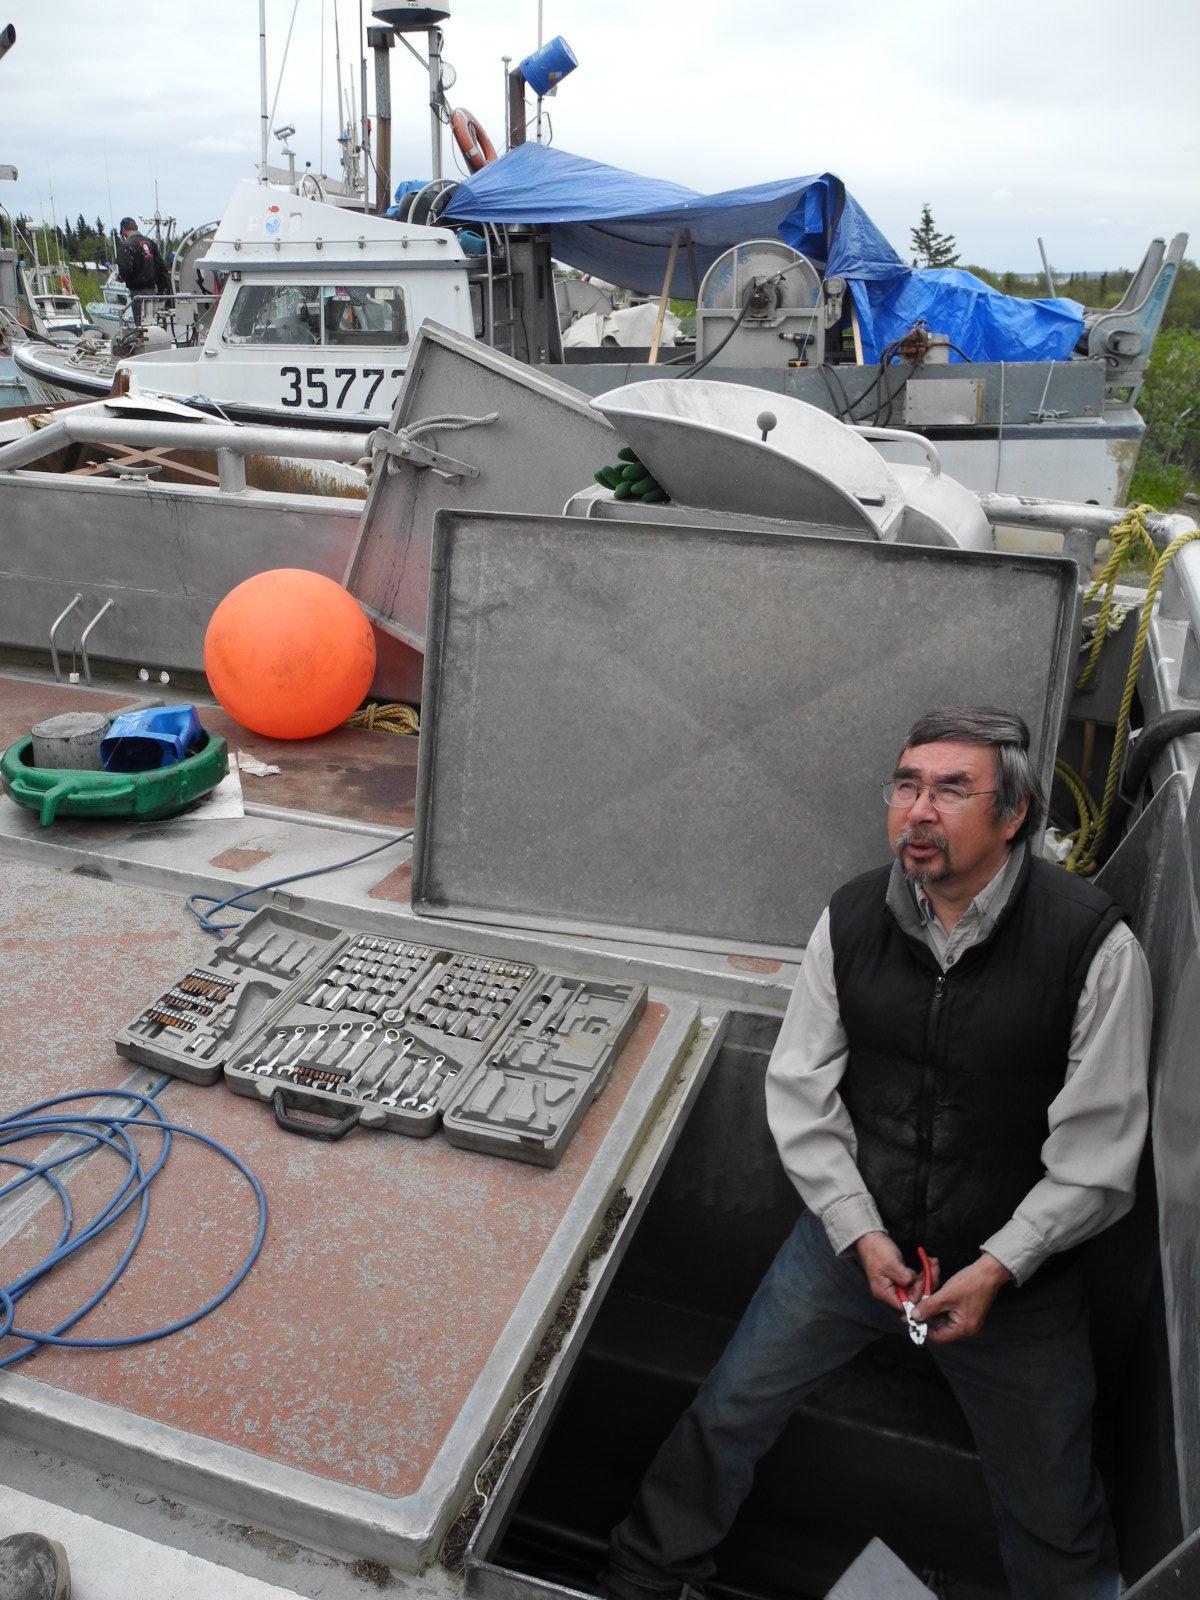 Chief Tom Tilden works on his fishing boat in Dillingham, Alaska